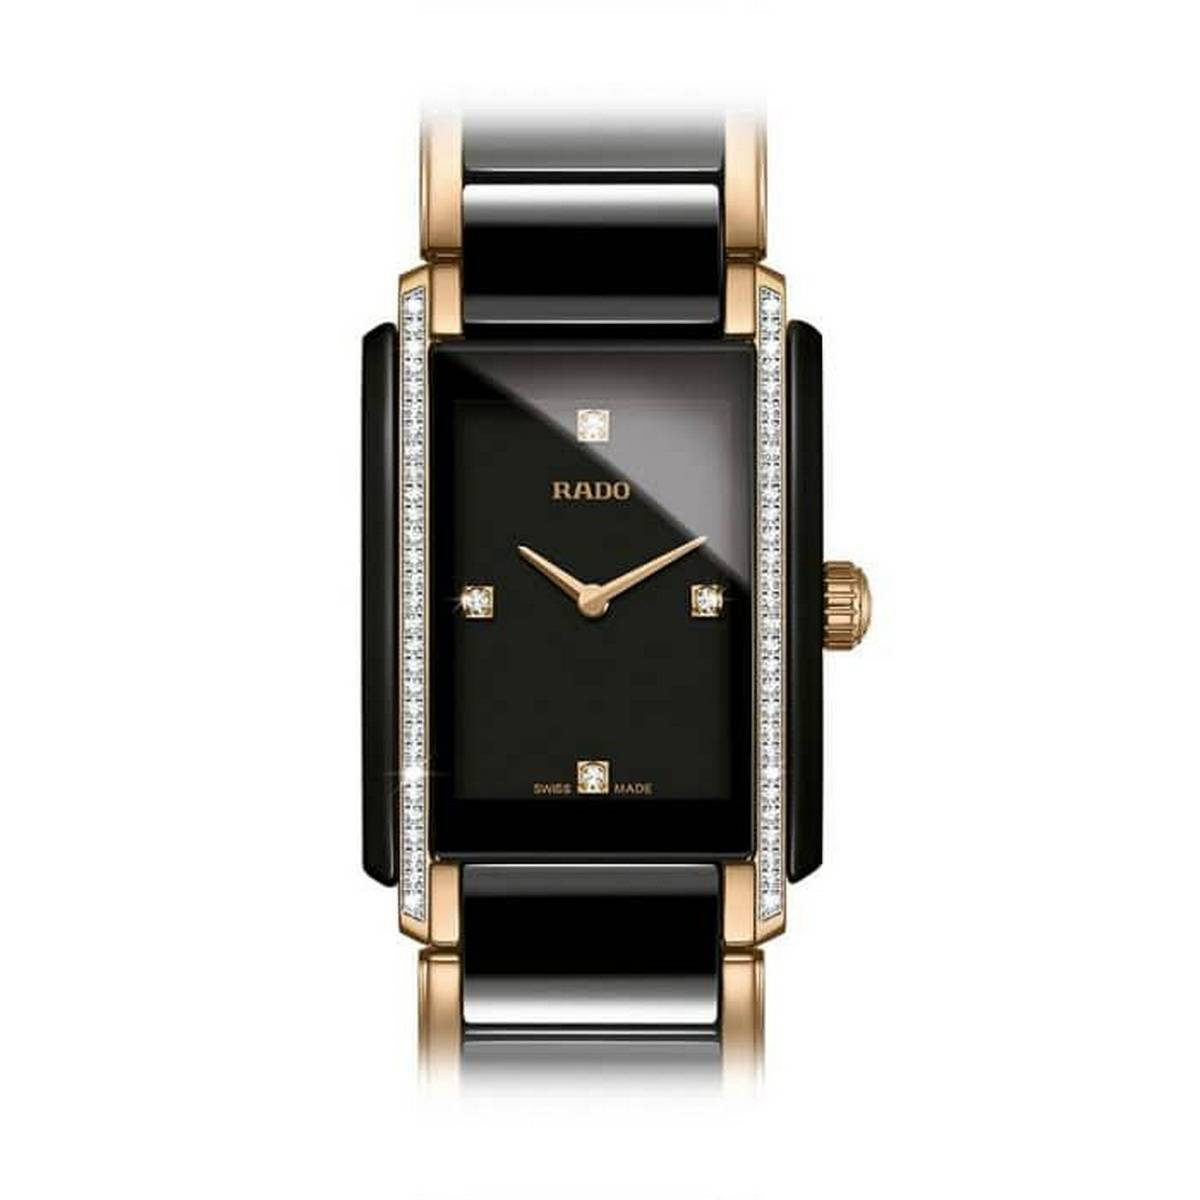 Rado Integral Black Dial Ladies Watch 153.0228.3071